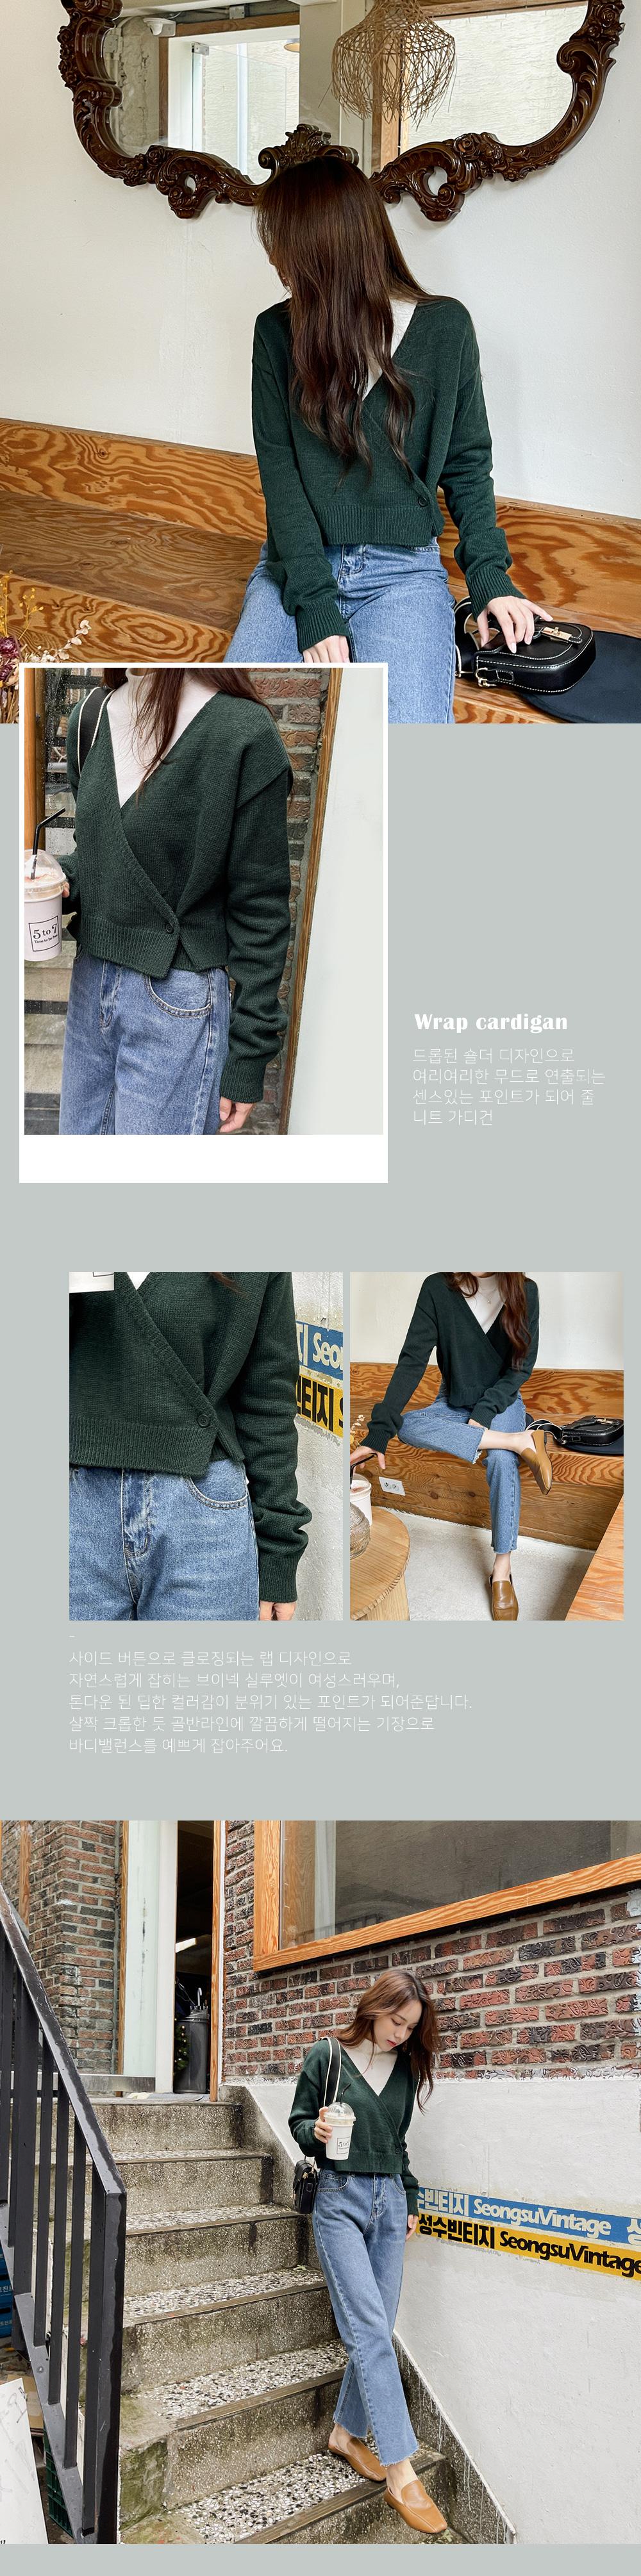 veil wrap cardigan